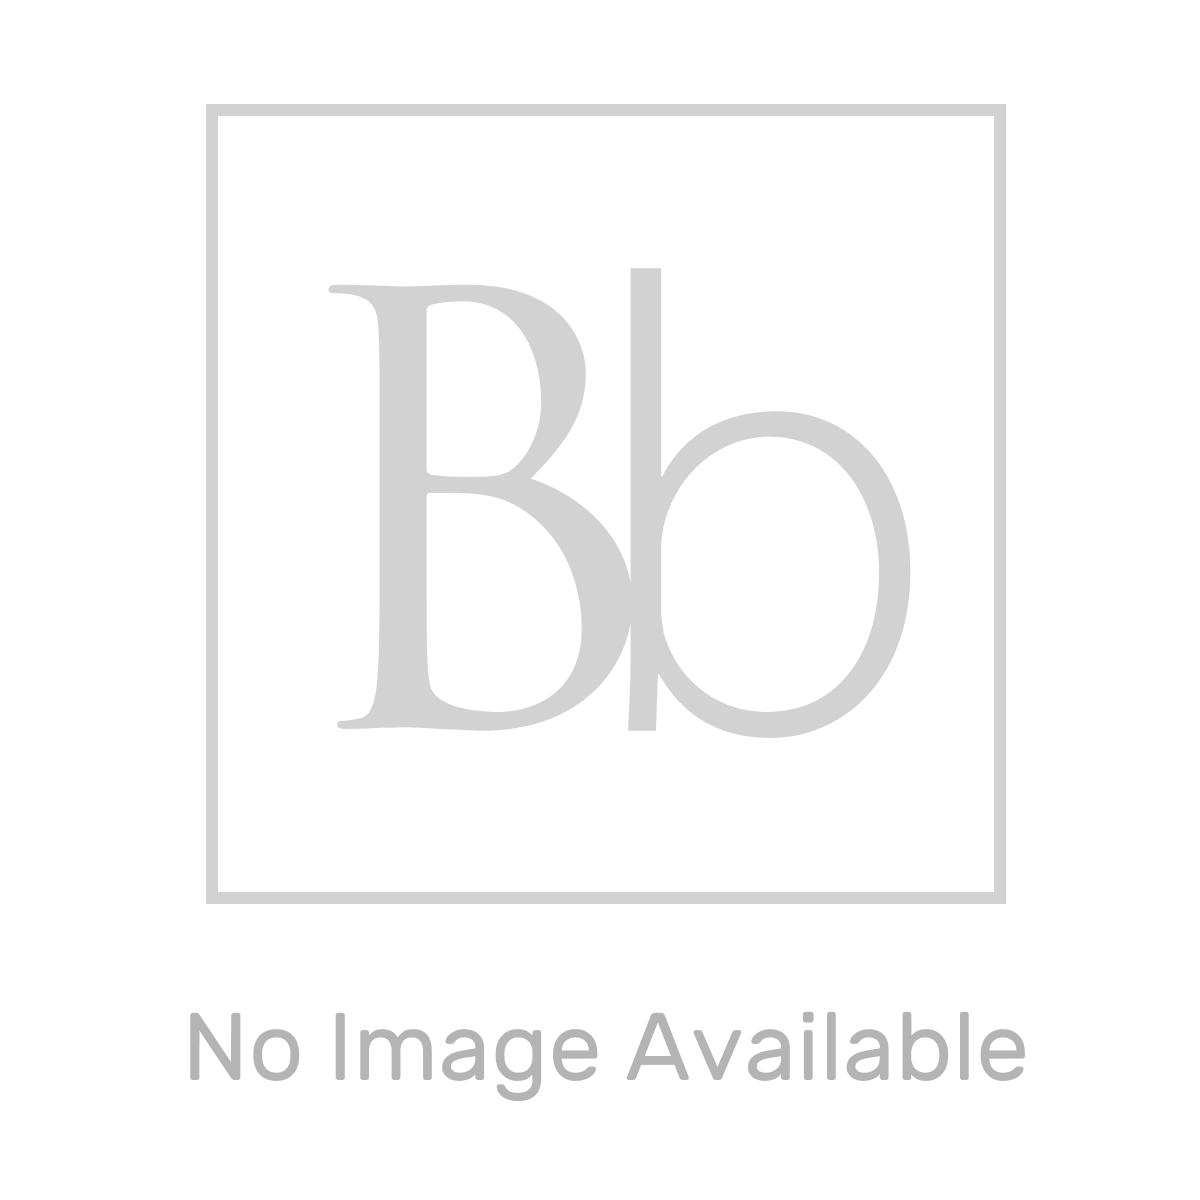 RAK Origin 62 Full Access Close Coupled Toilet with Soft Close Seat Measurements